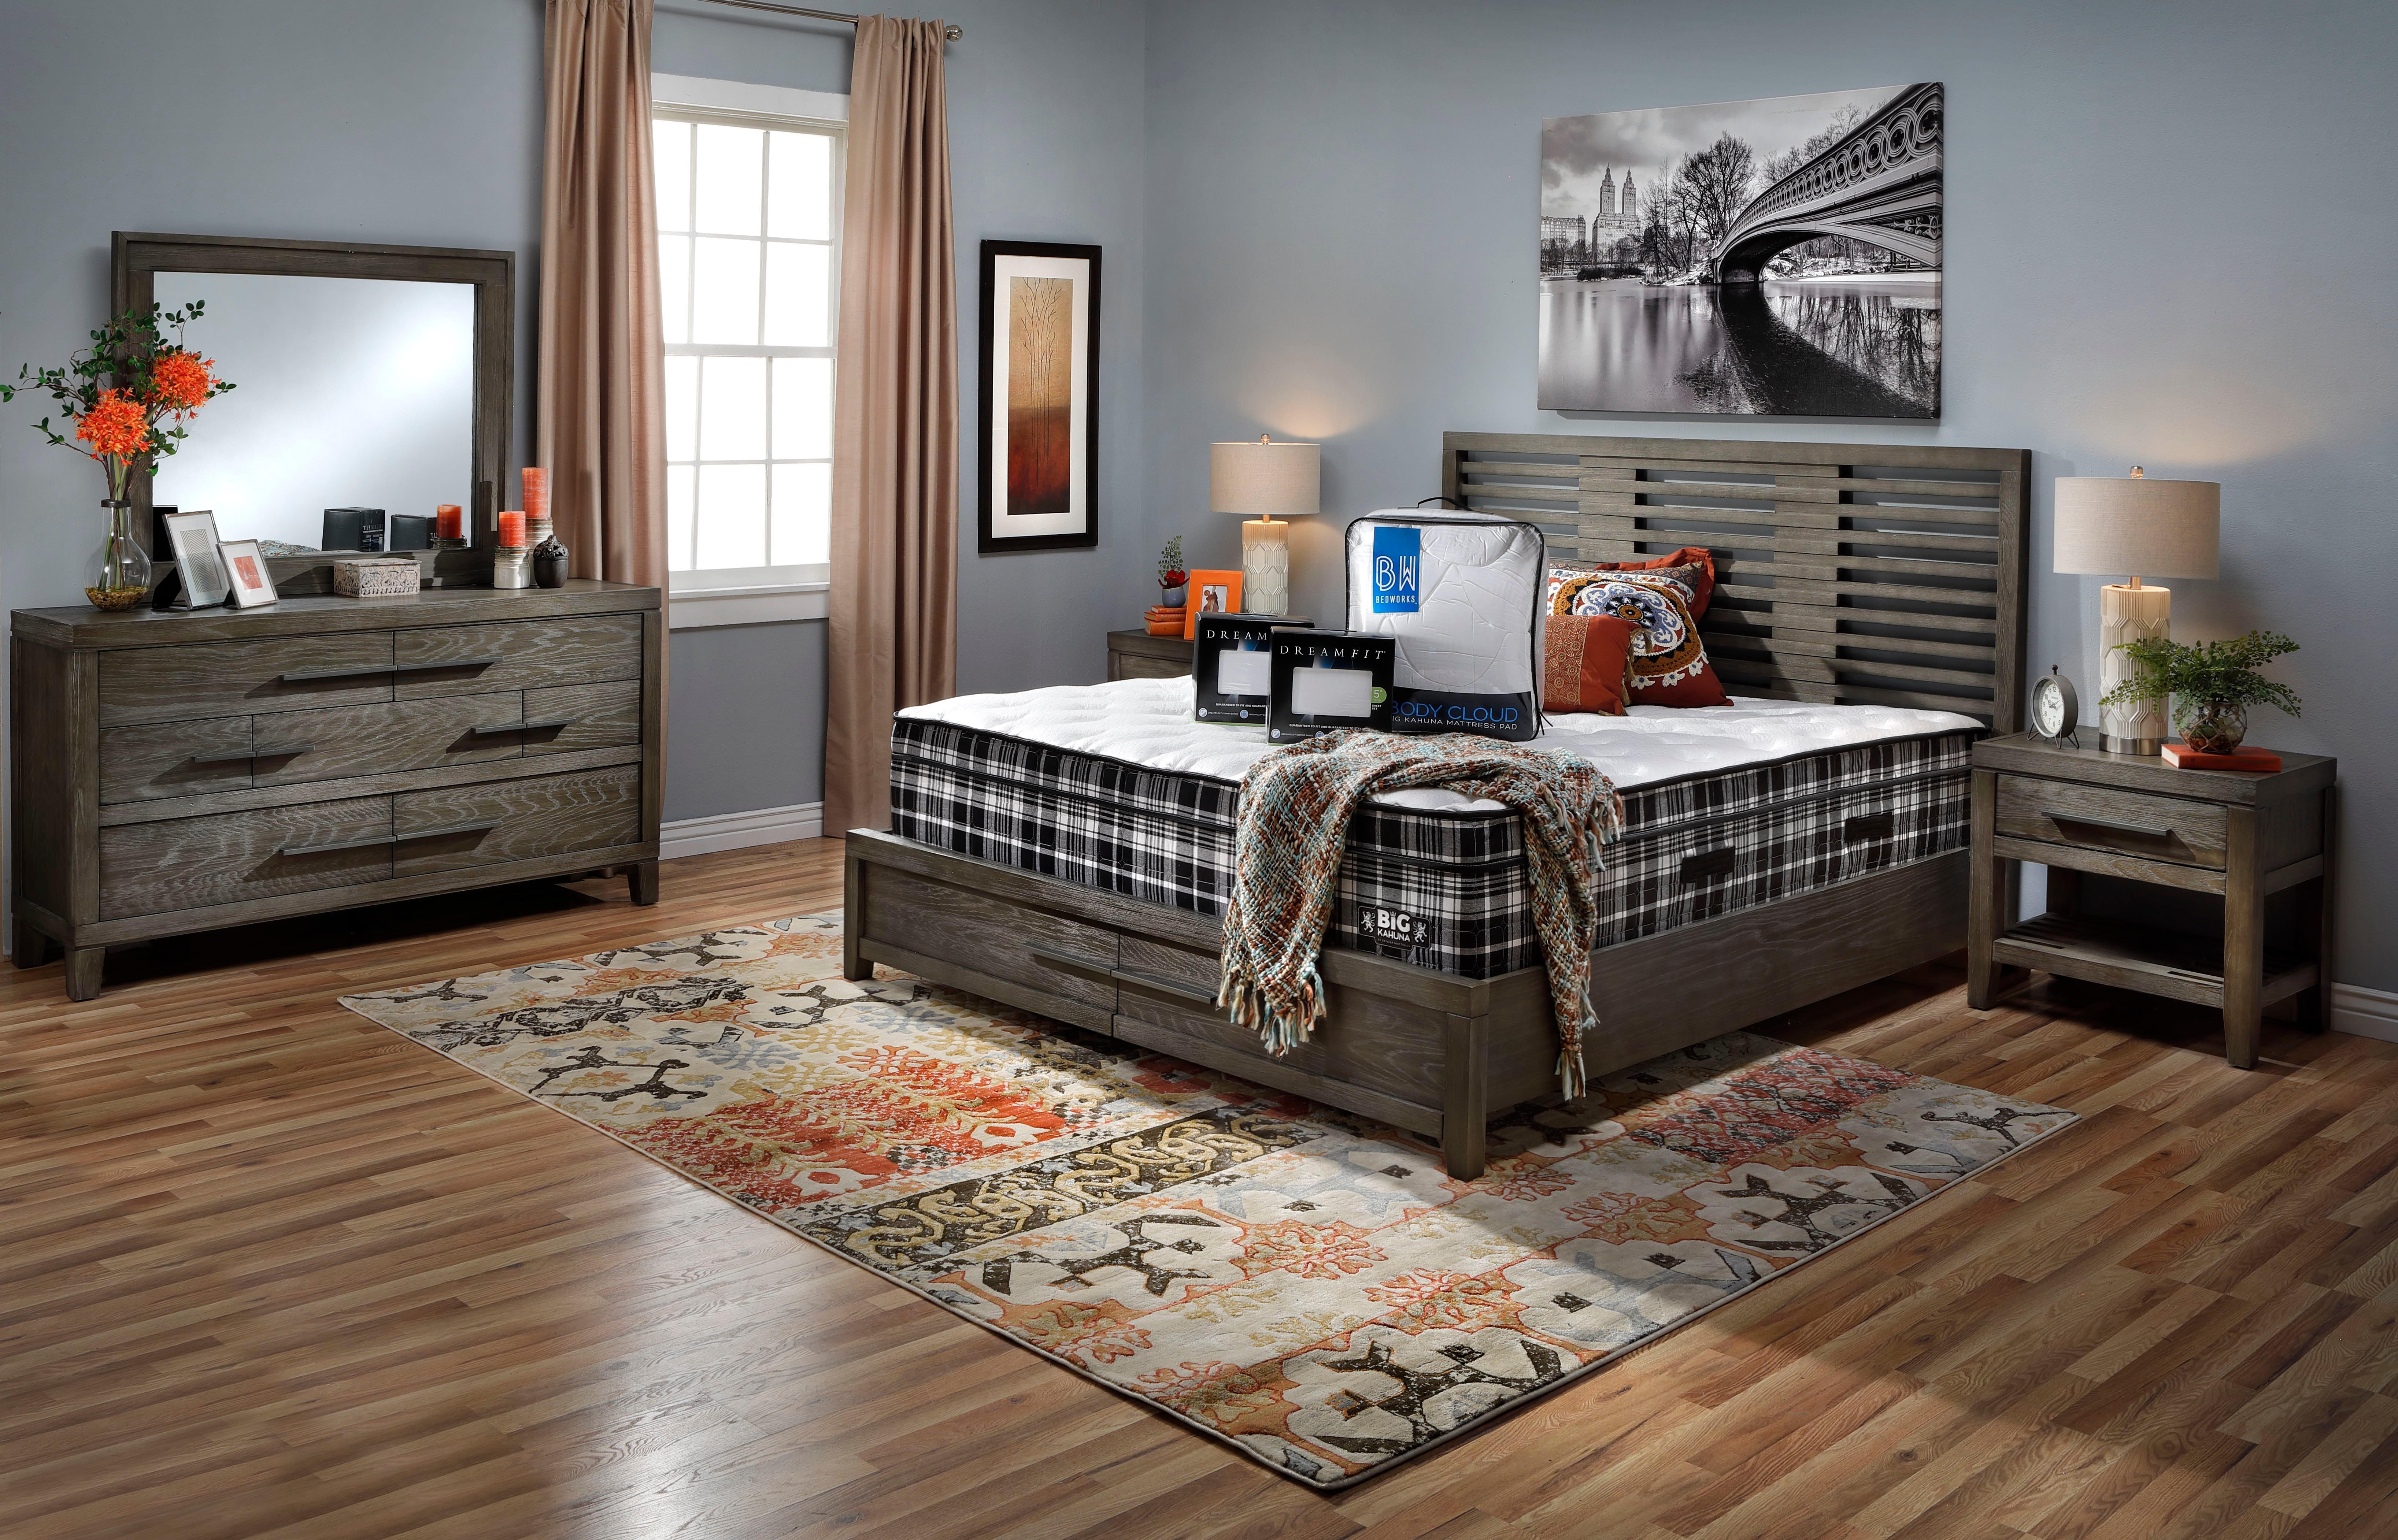 Denver Mattress Company image 7